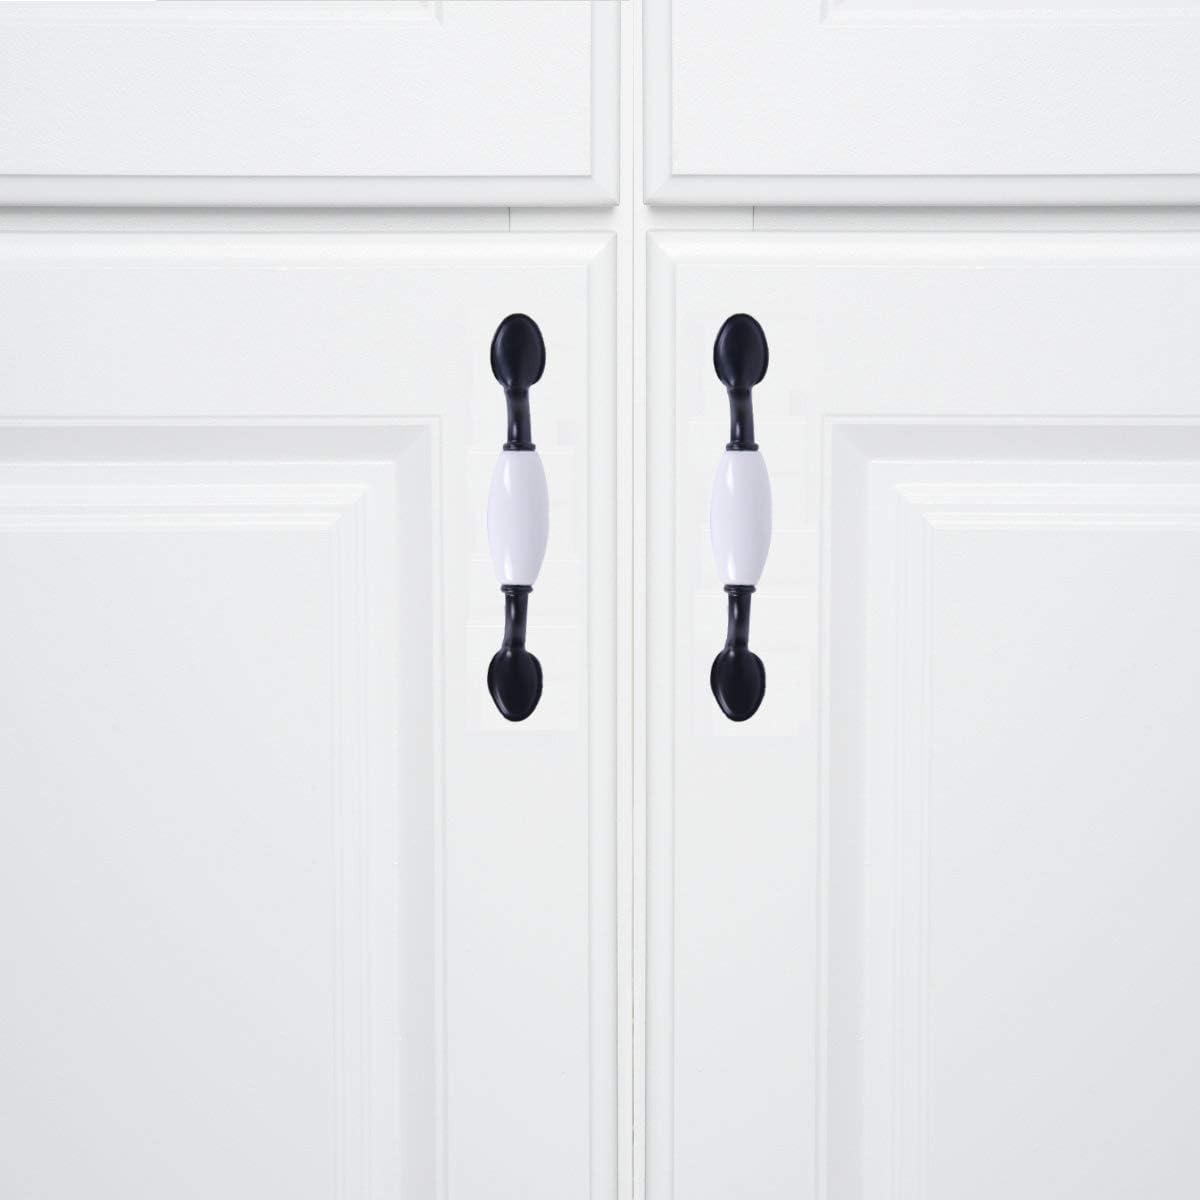 Leaf/&cici-10 Pieces Vintage White Black Wardrobe Door Handles Ceramic Zinc Alloy Cabinet Drawer Pulls 76mm//3Screw Spacing